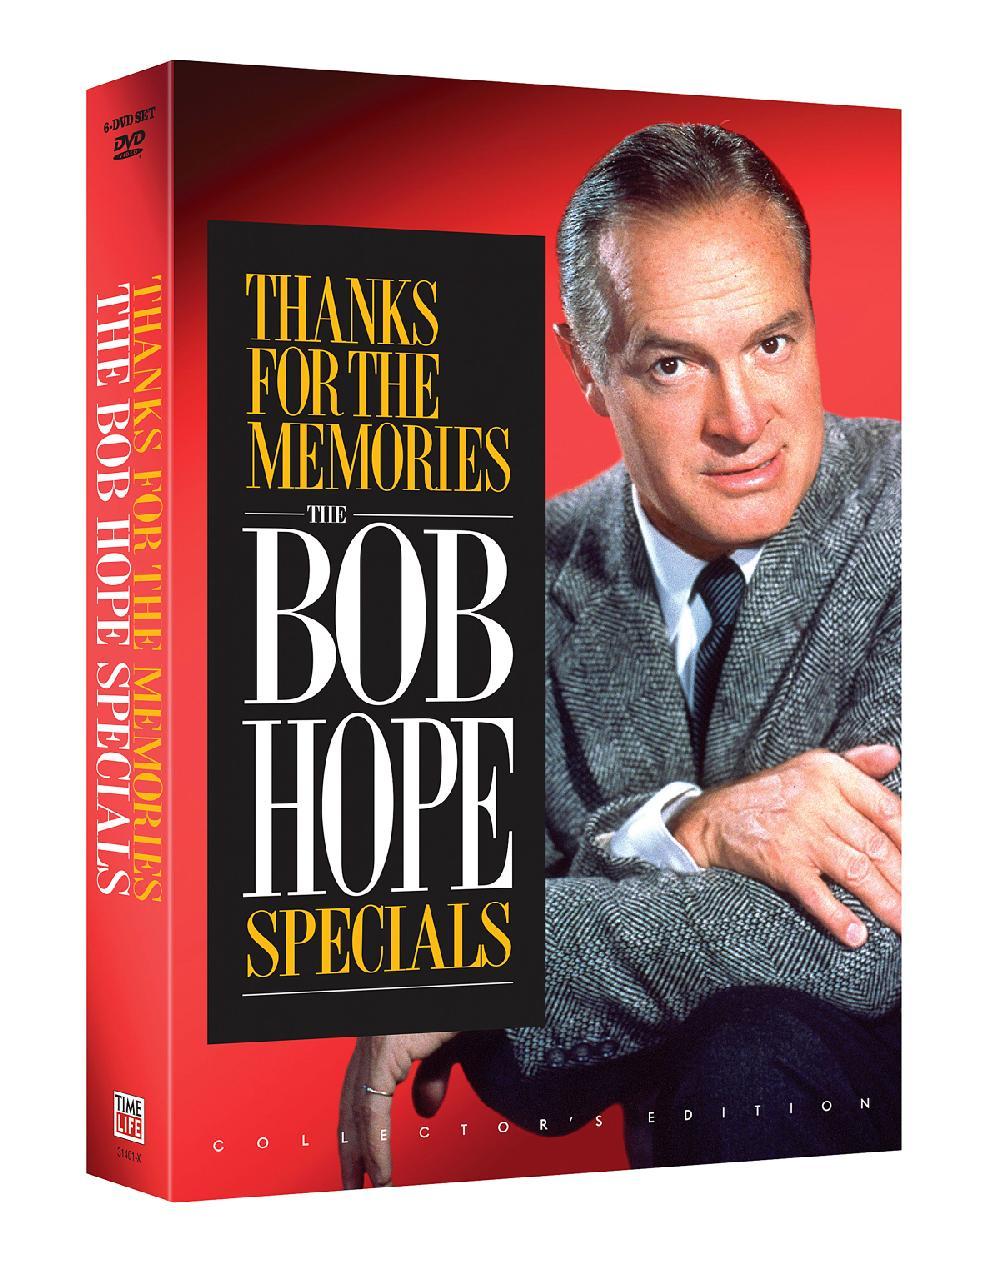 Bob Hope Specials bundle stars into funny skits, music